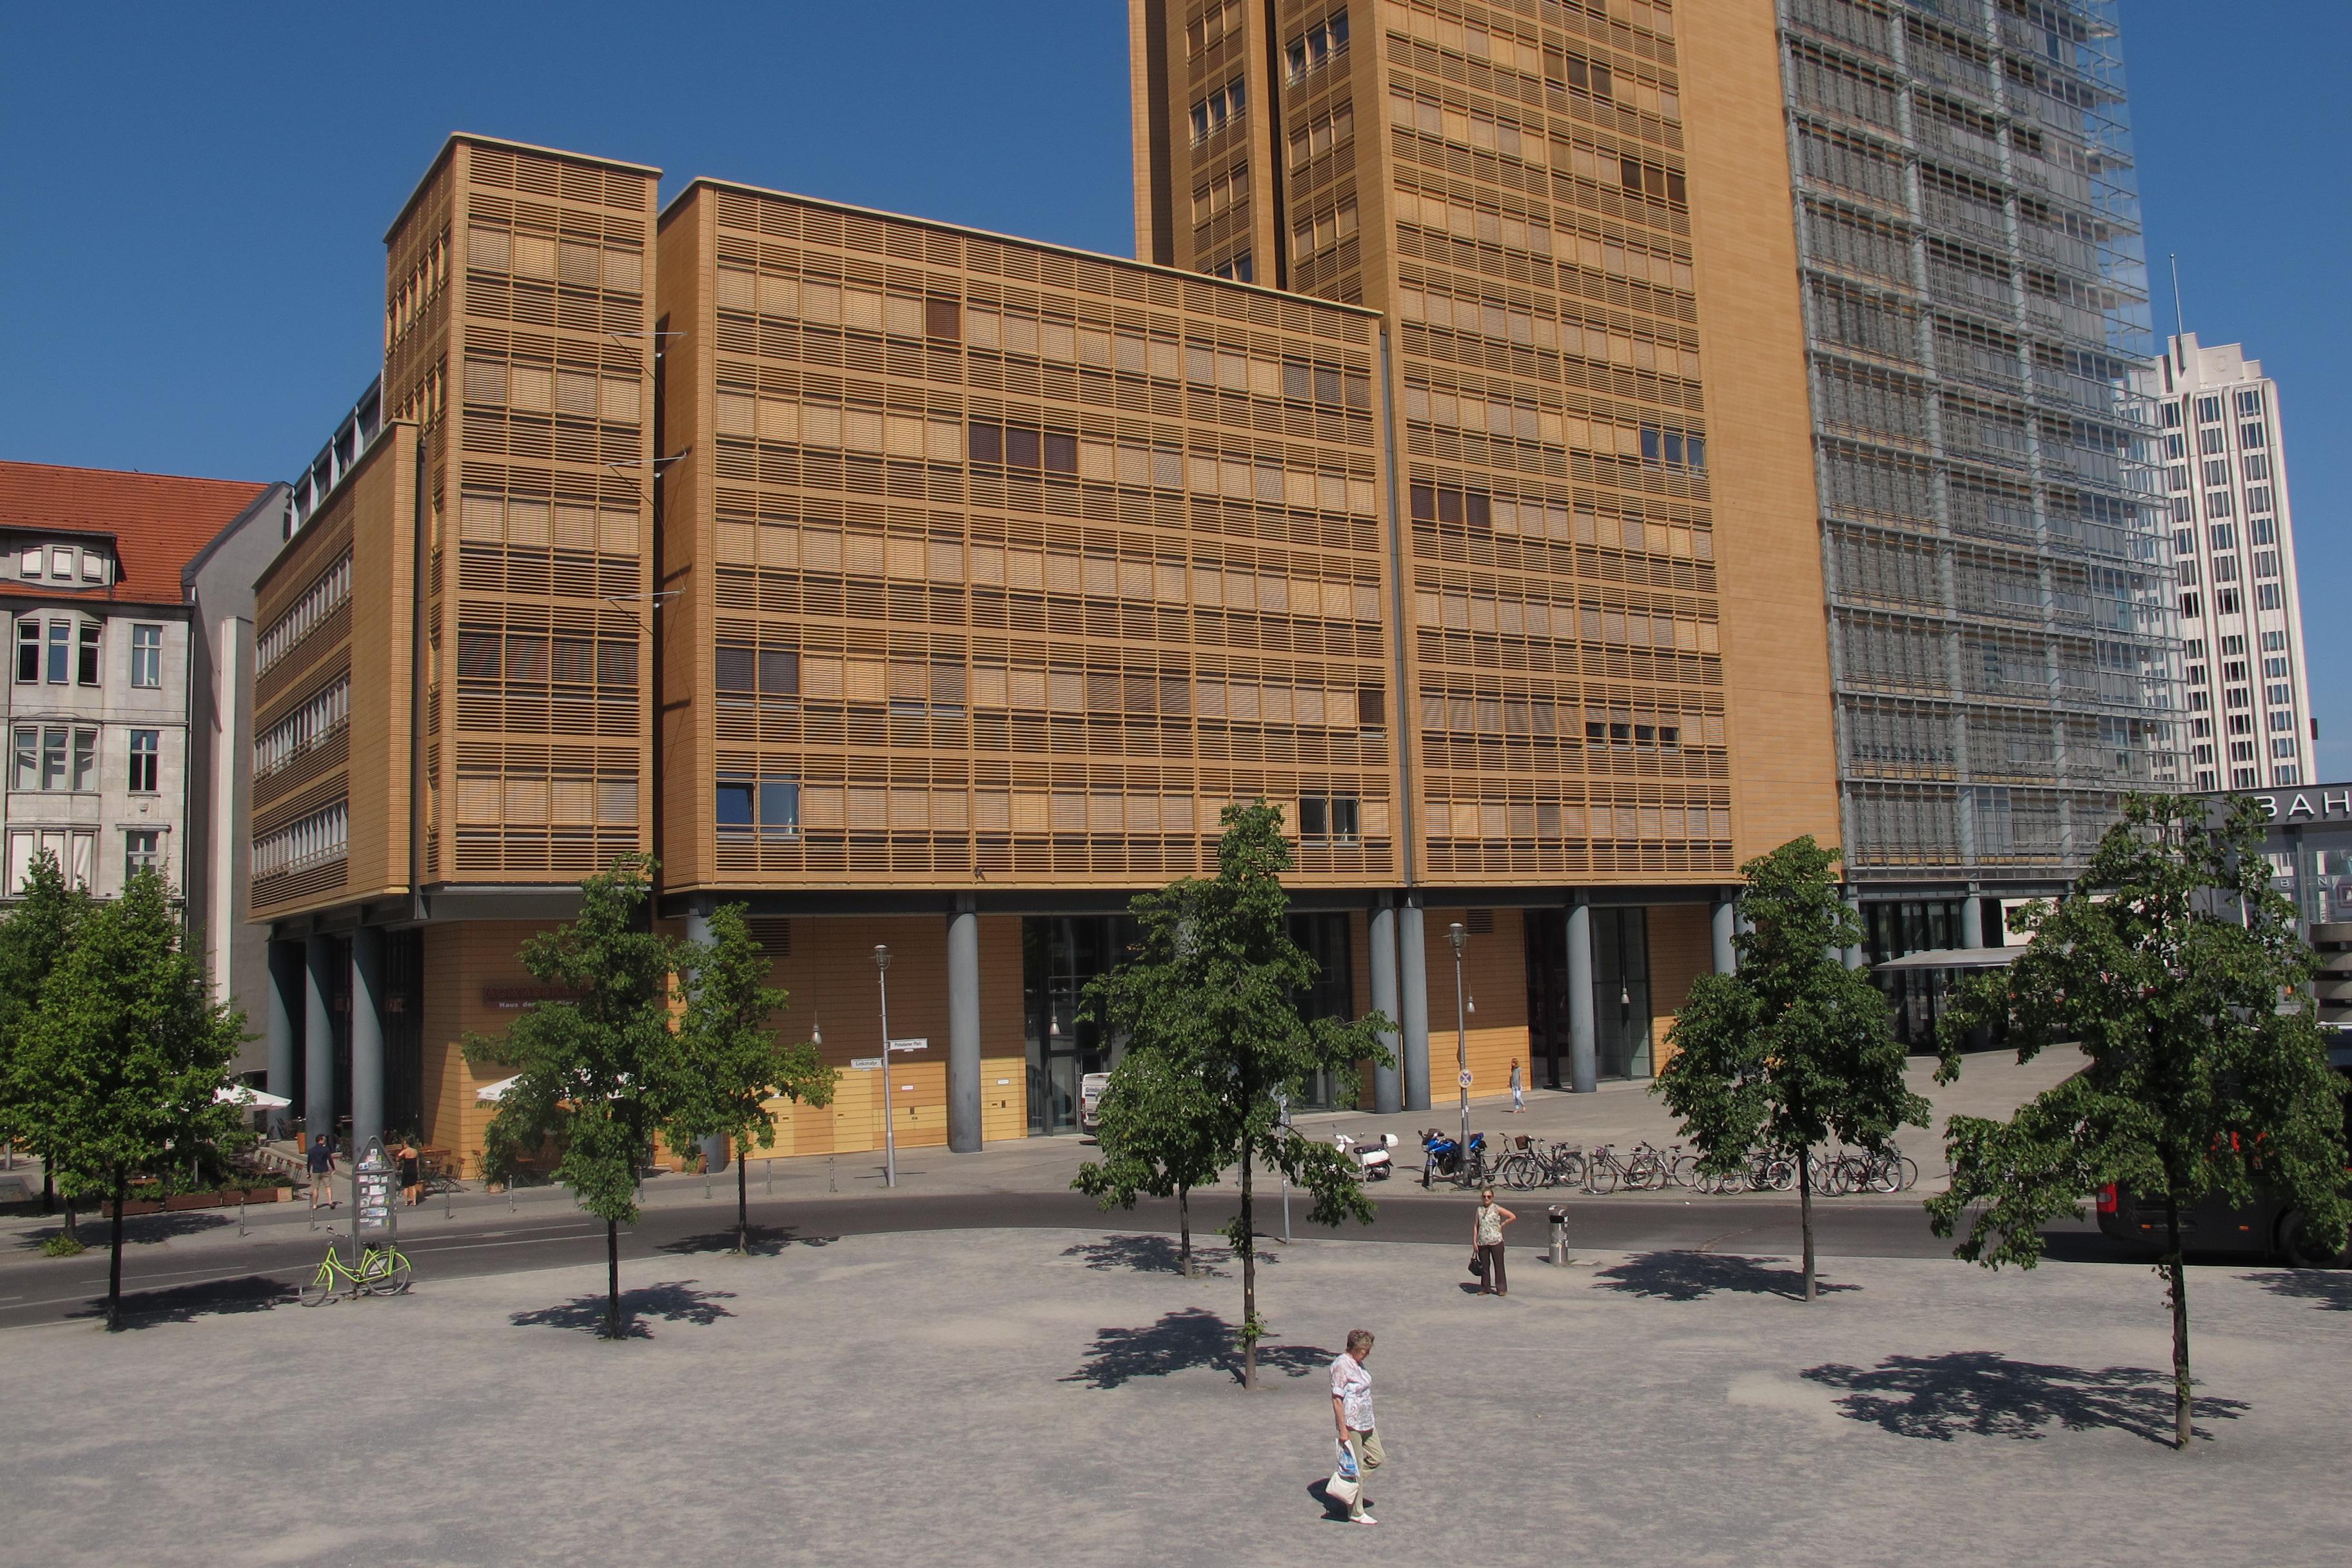 Edifici de Renzo Piano des de la Linkstrasse.